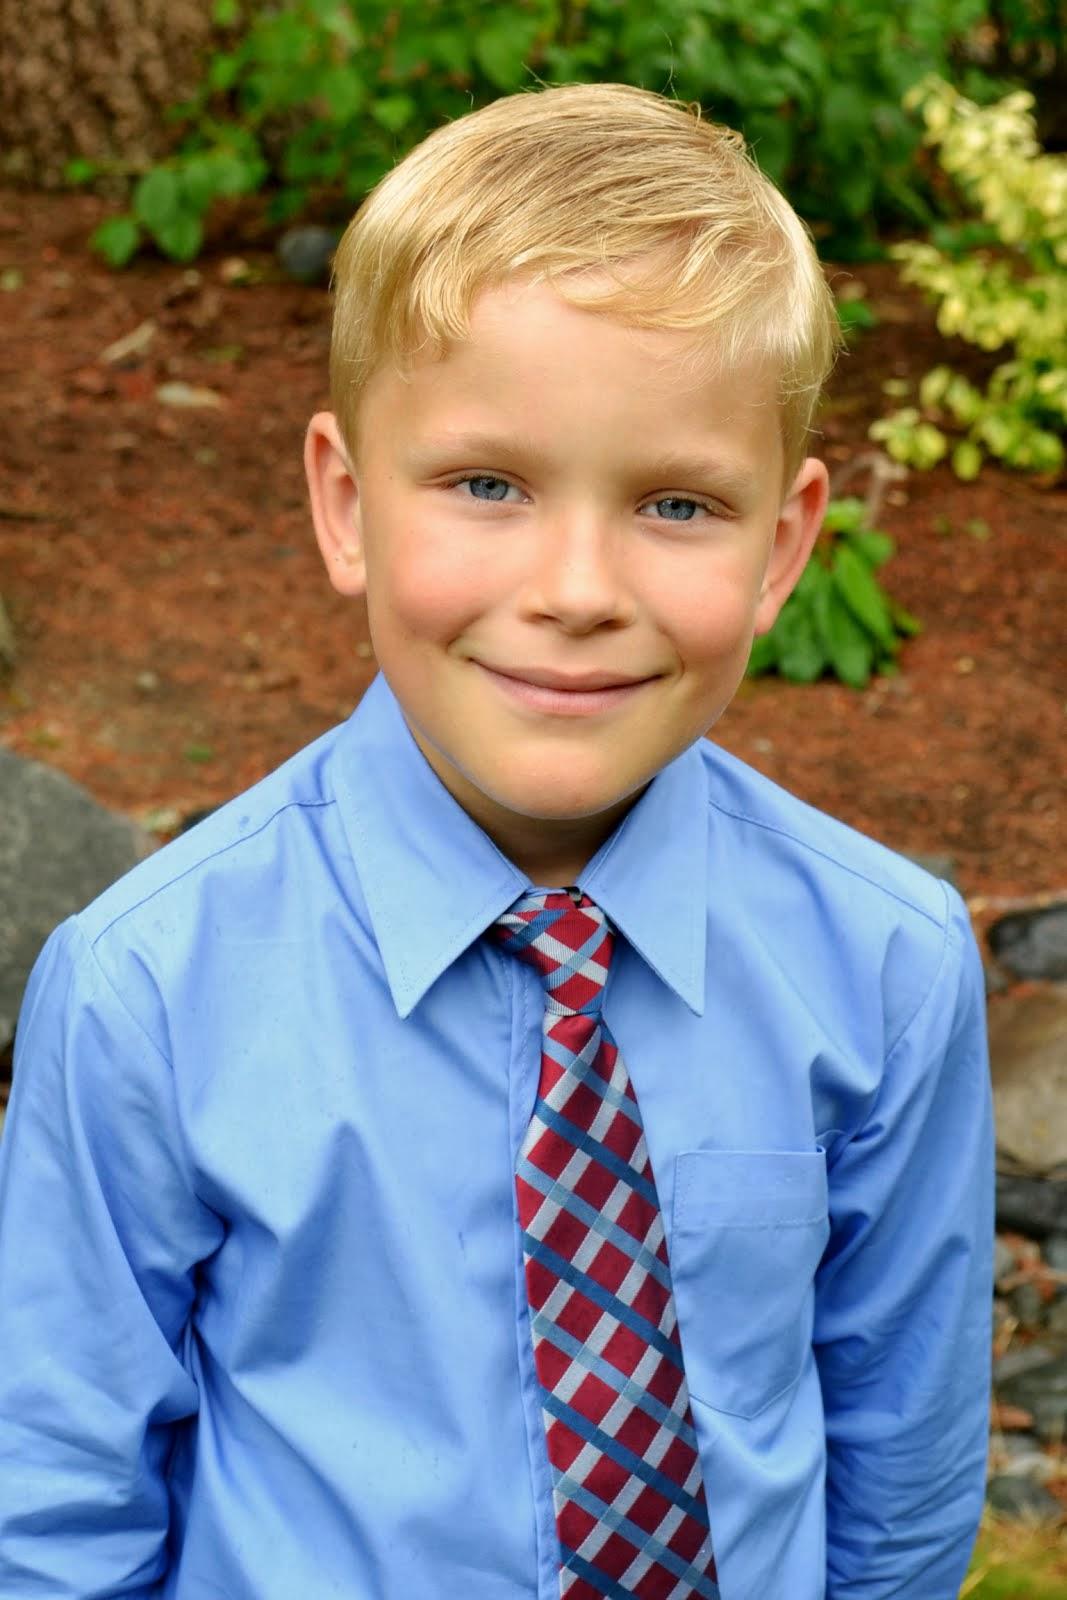 Joshua - Age 6